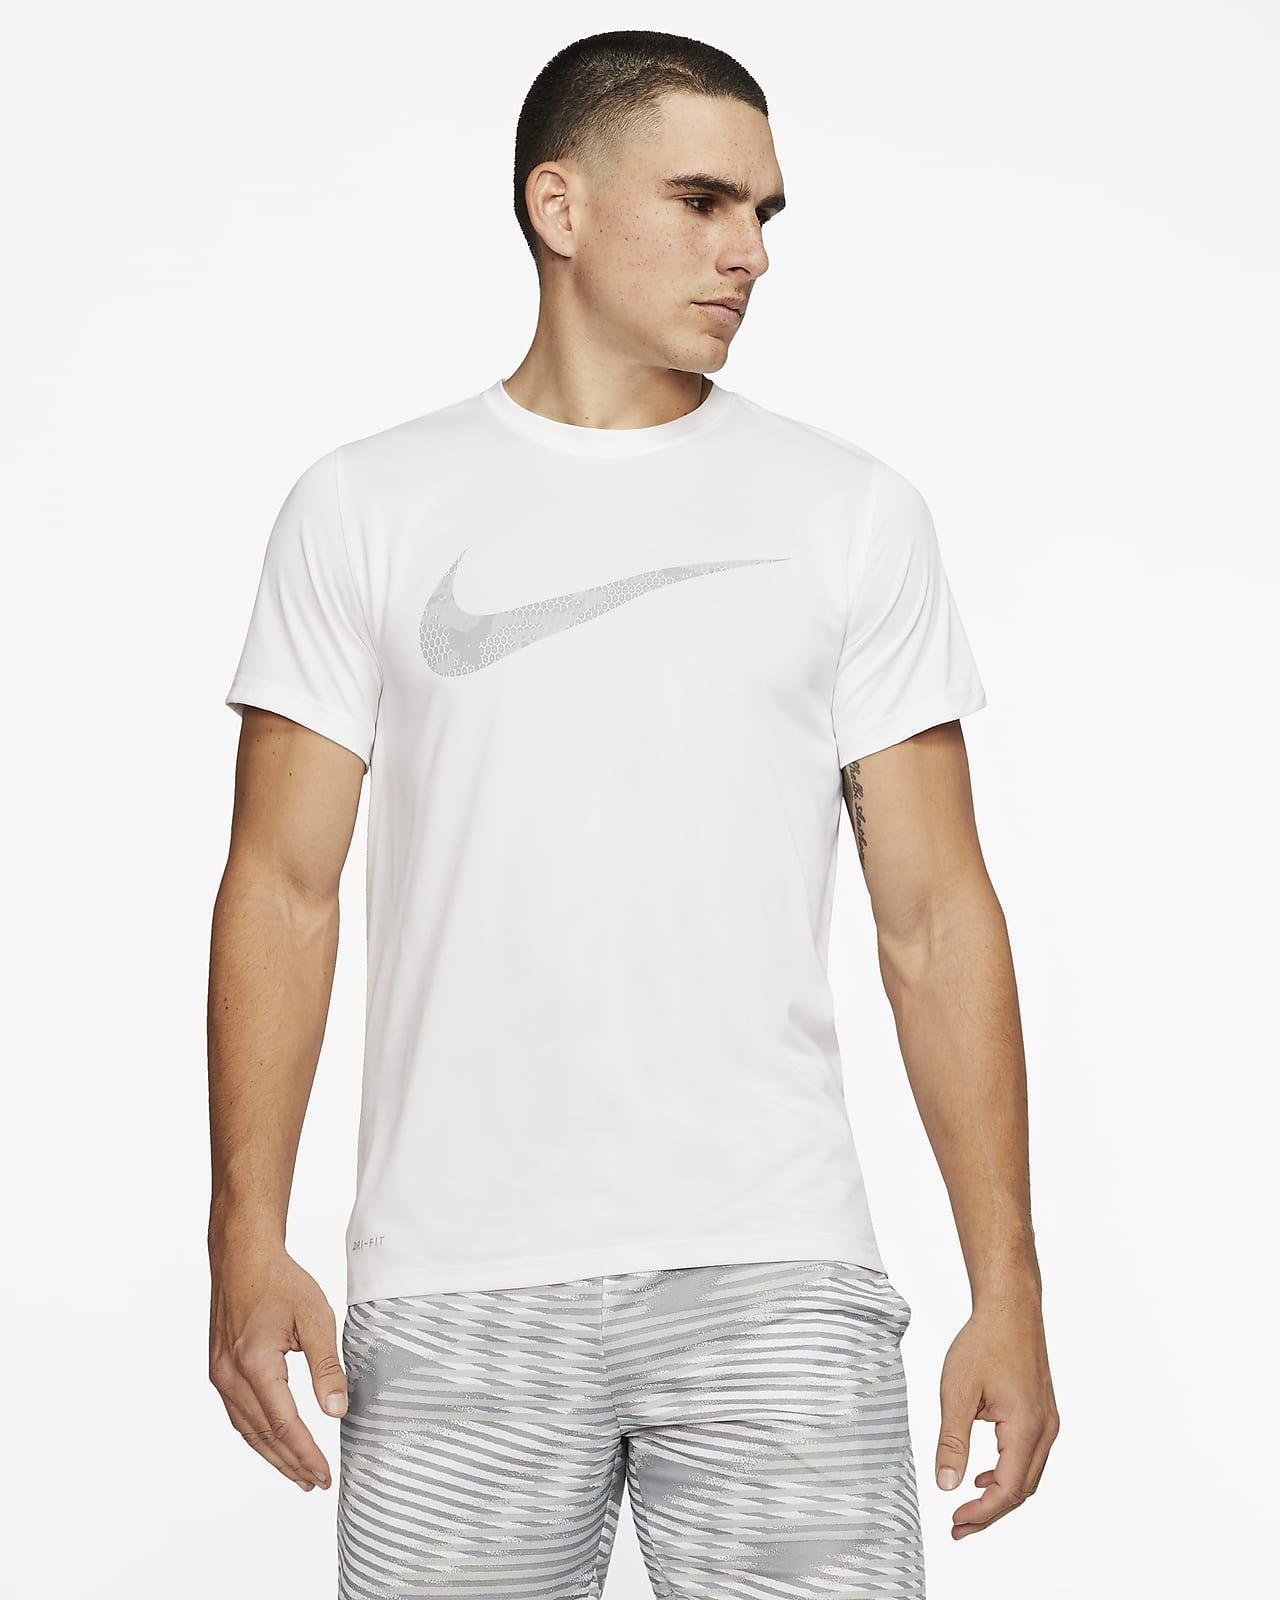 Nike Dri FIT Legend Men's Camo Swoosh Training T Shirt